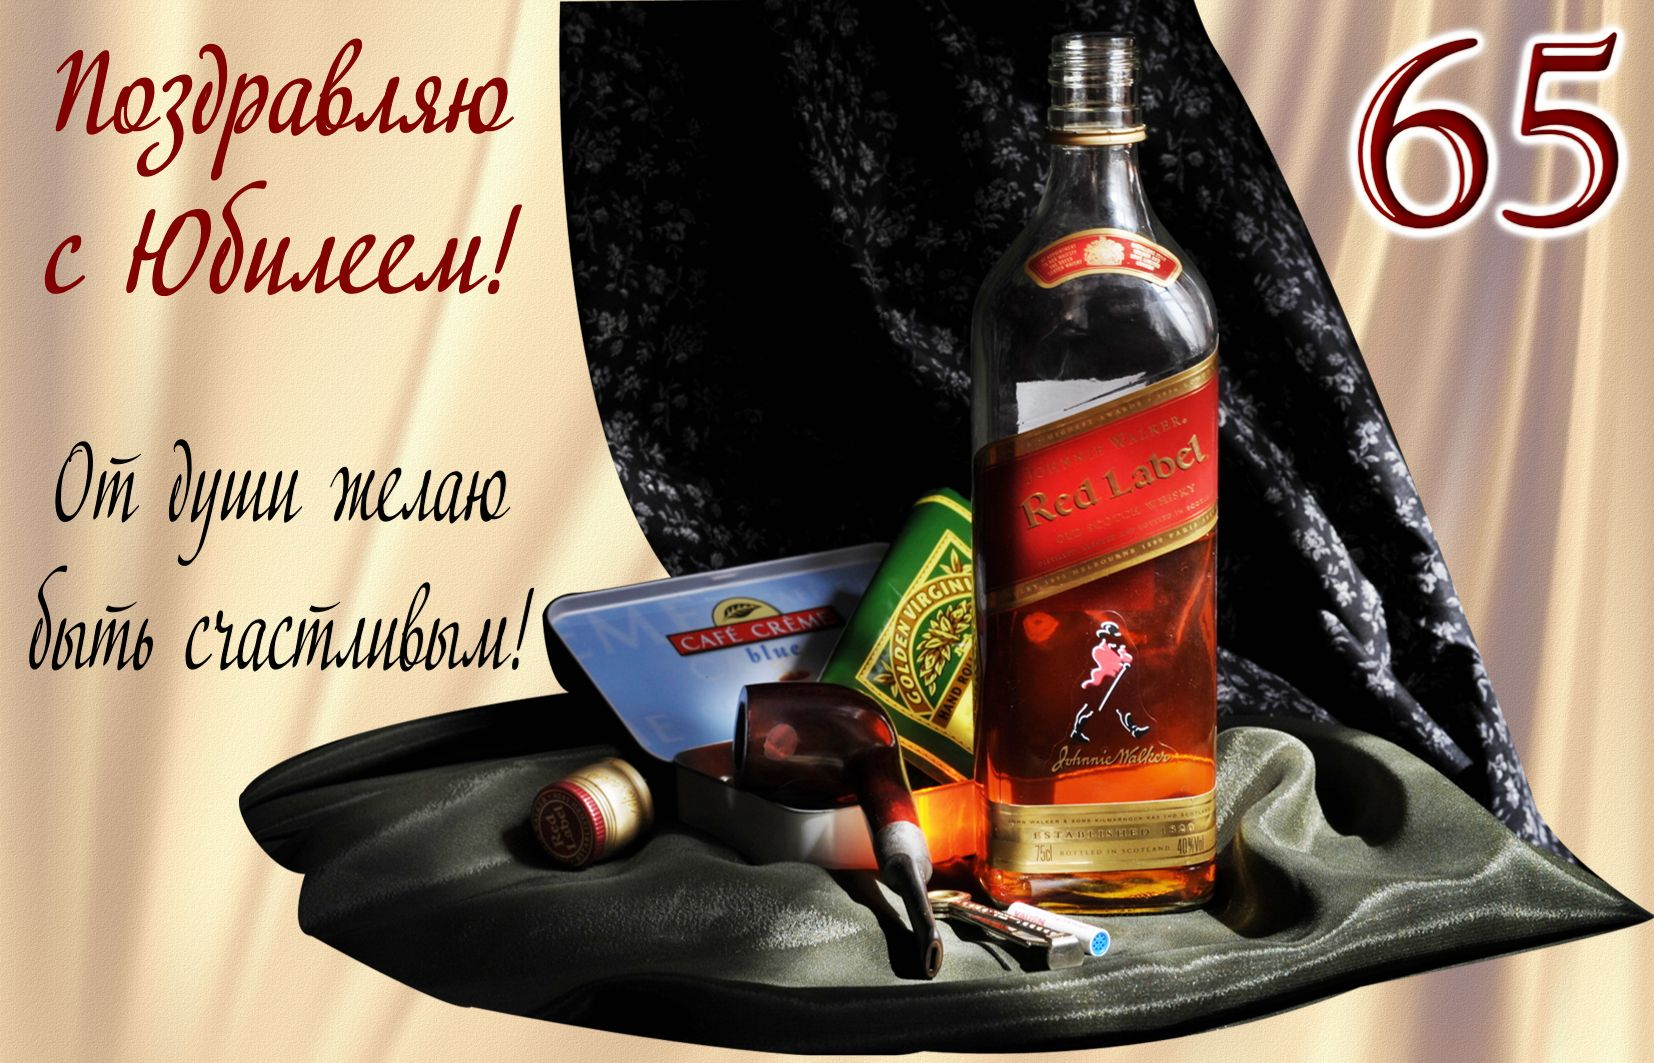 Открытка на юбилей 65 лет - пожелание и виски на черном бархате